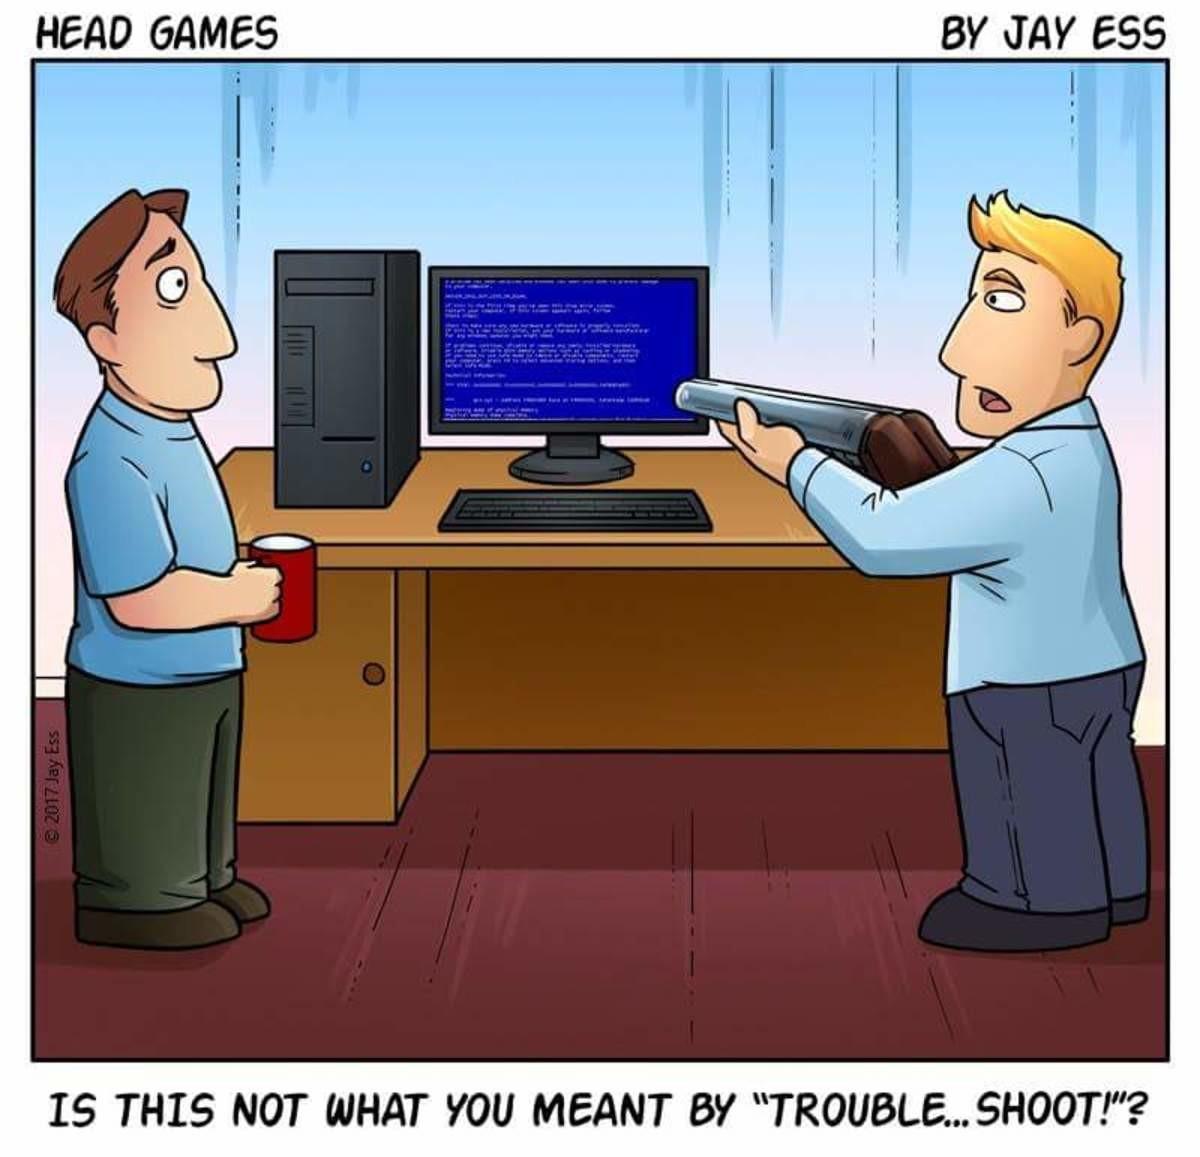 Troubleshoot. .